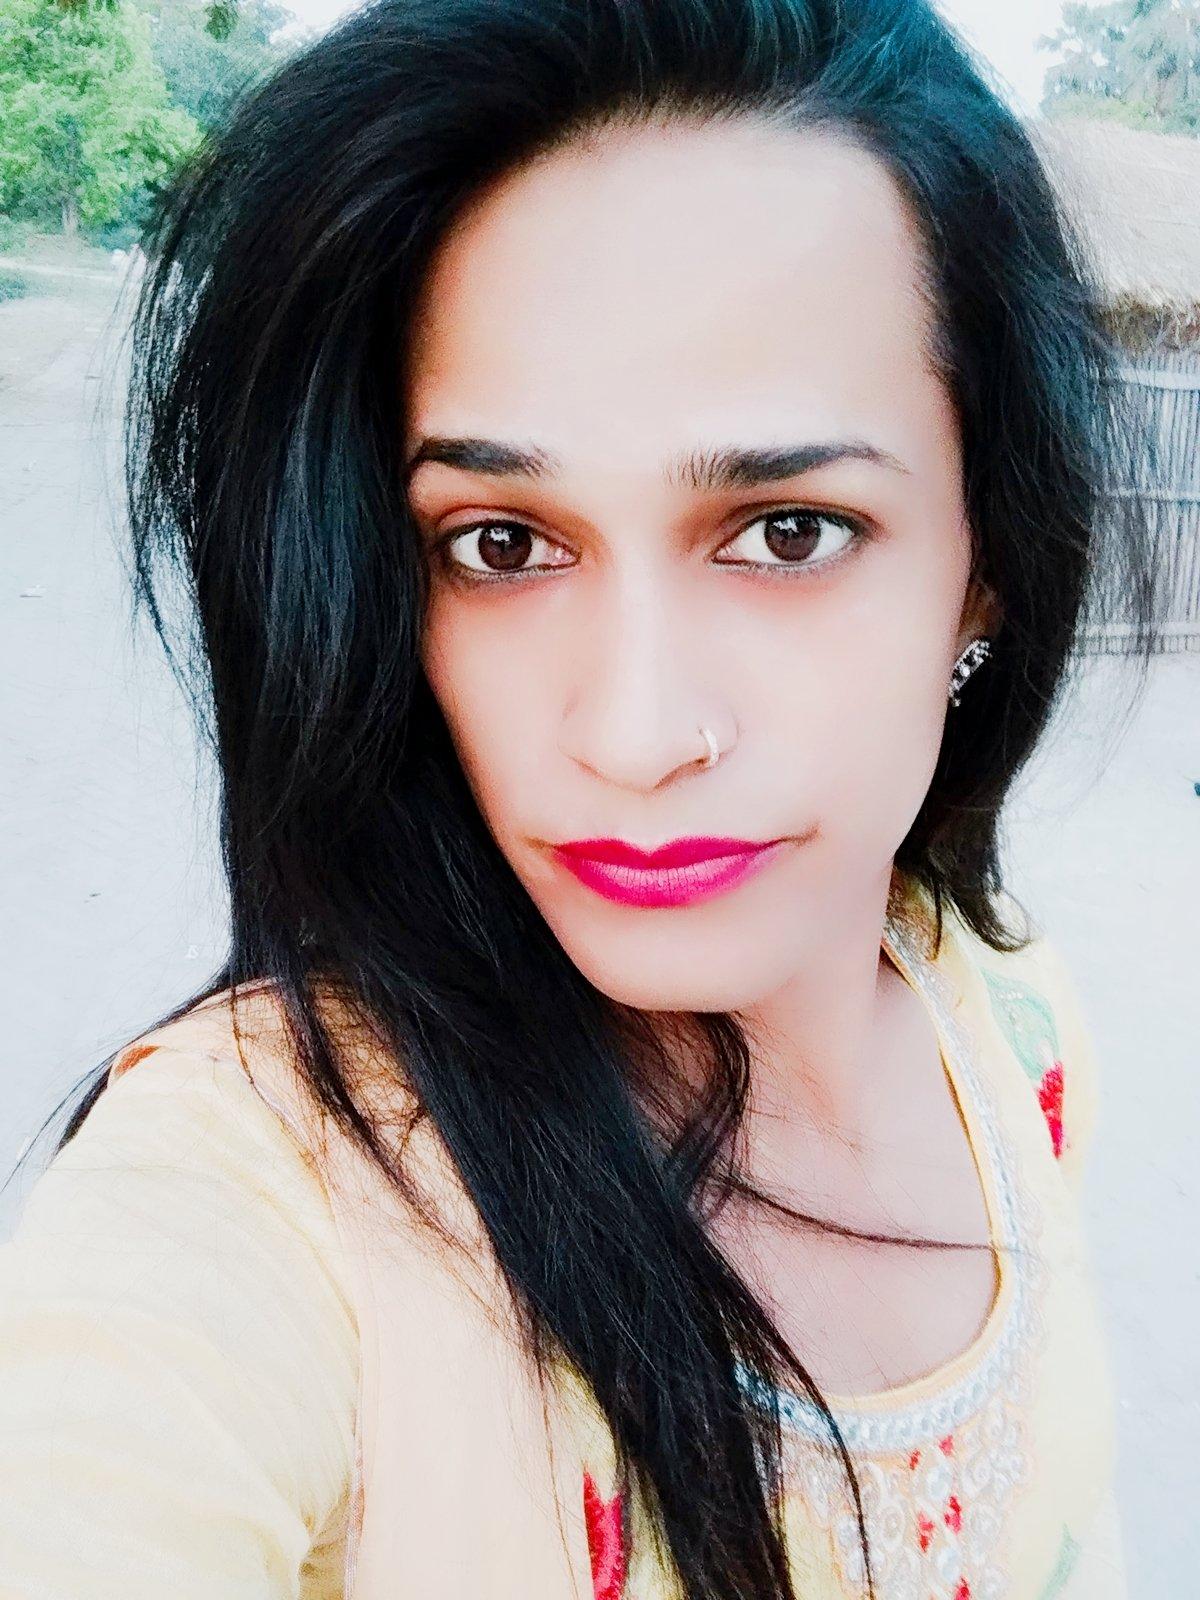 Kajalkhan, Indian Transsexual escort in New Delhi